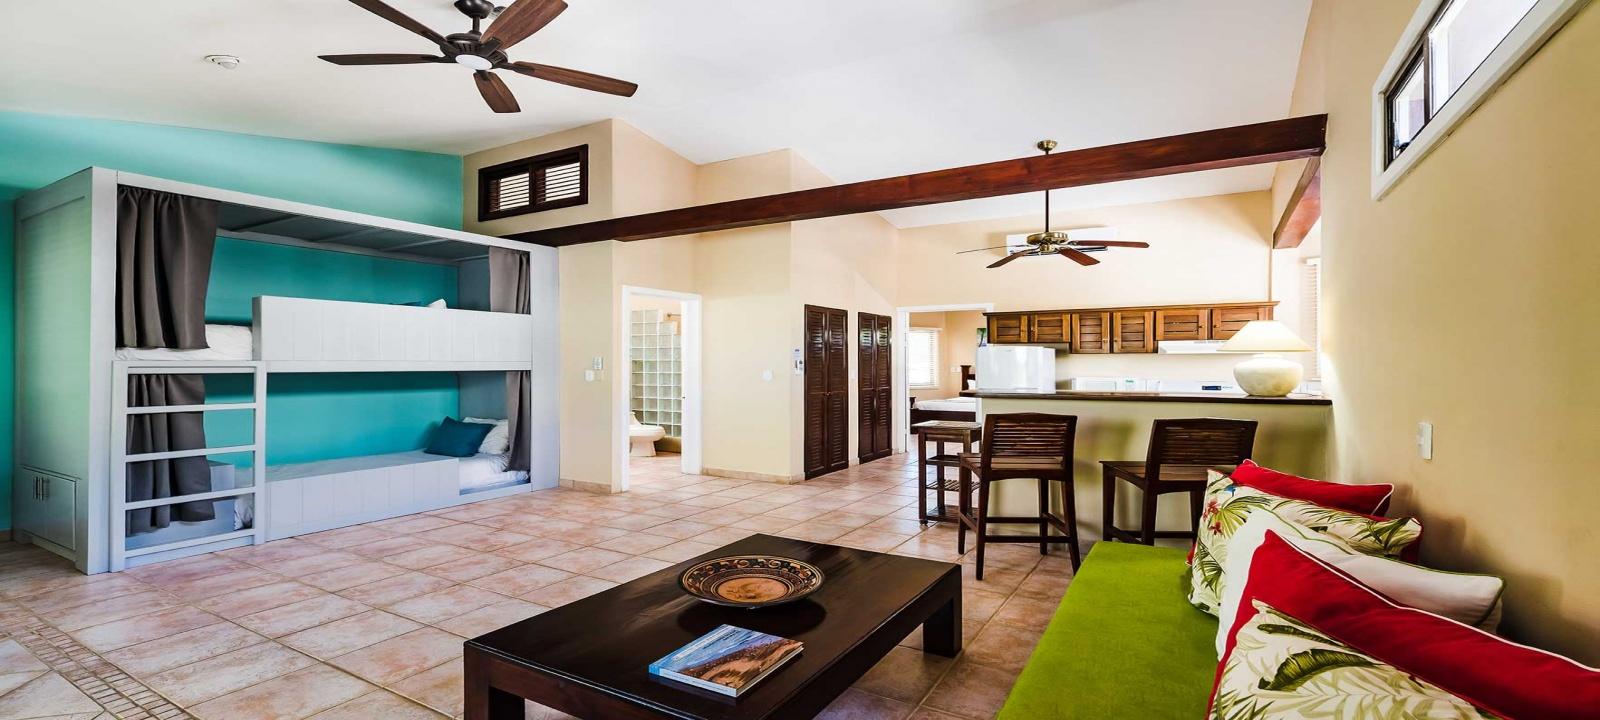 Playa Potrero, Costa Rica, ,International Properties,For Sale,1082